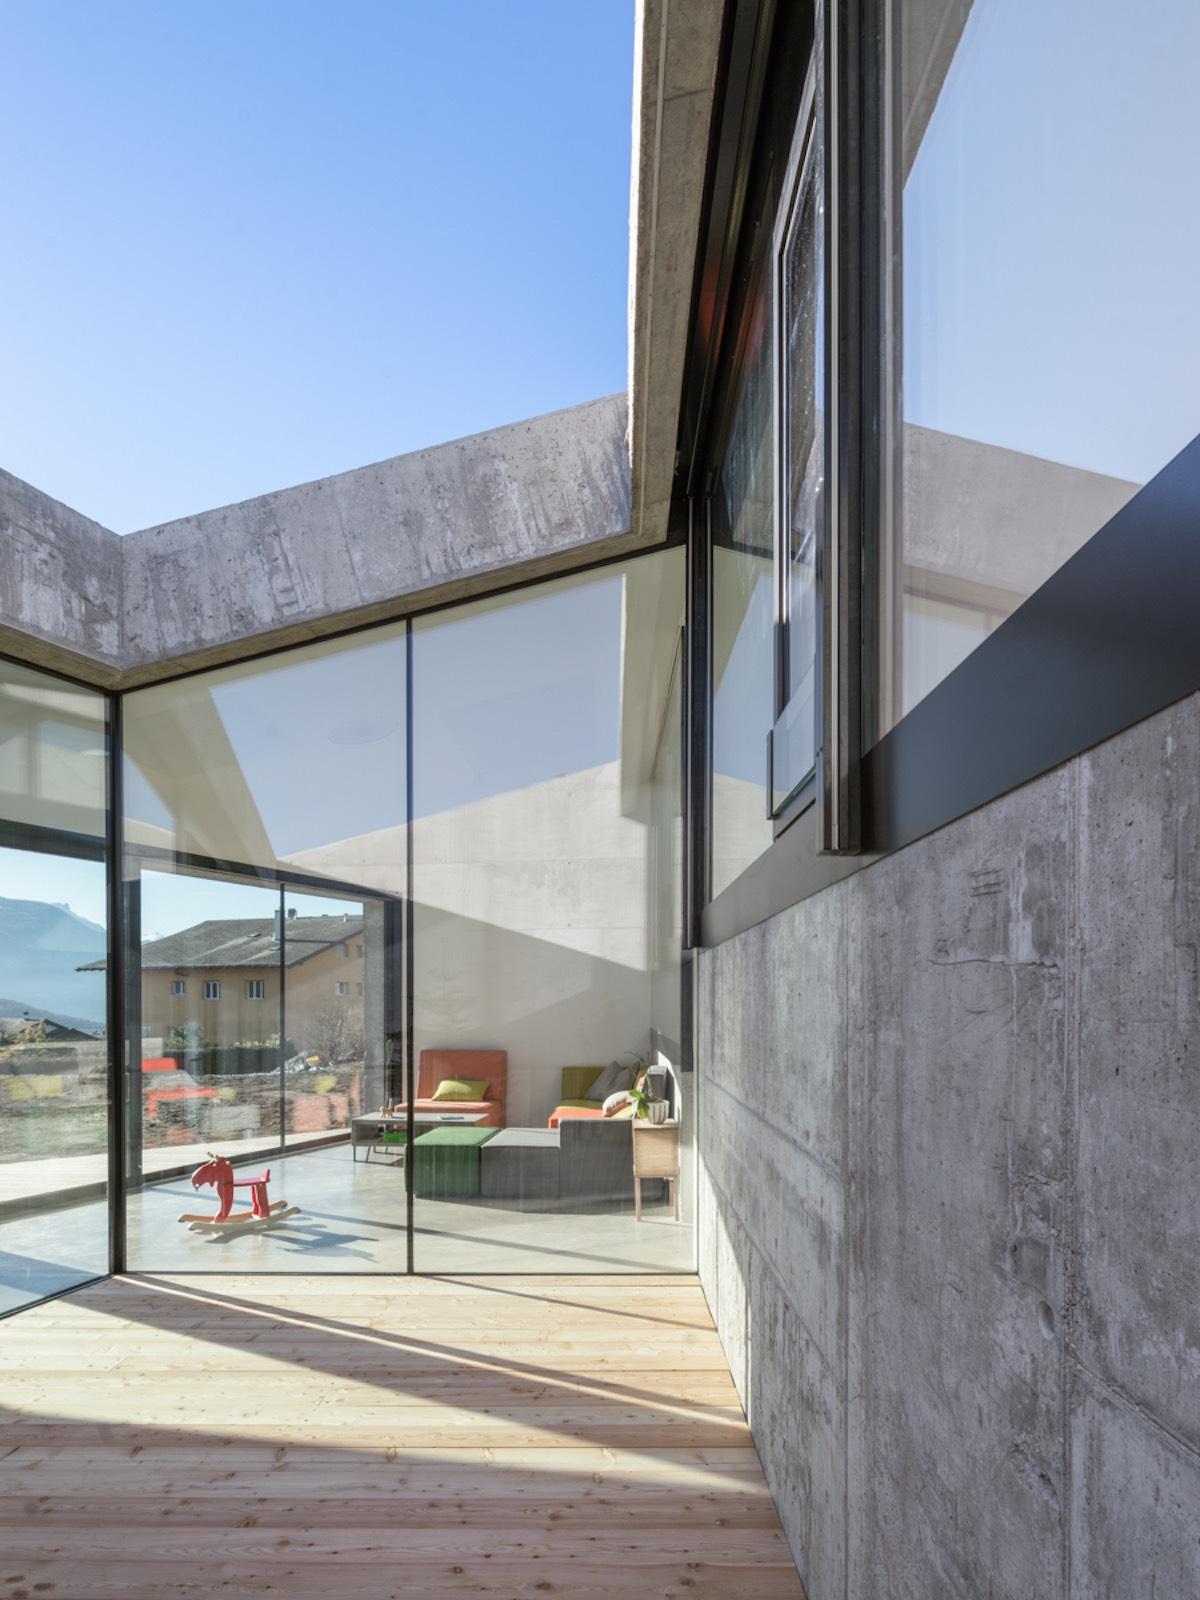 Architecture_House_Saviese_Anako_Architecture_02